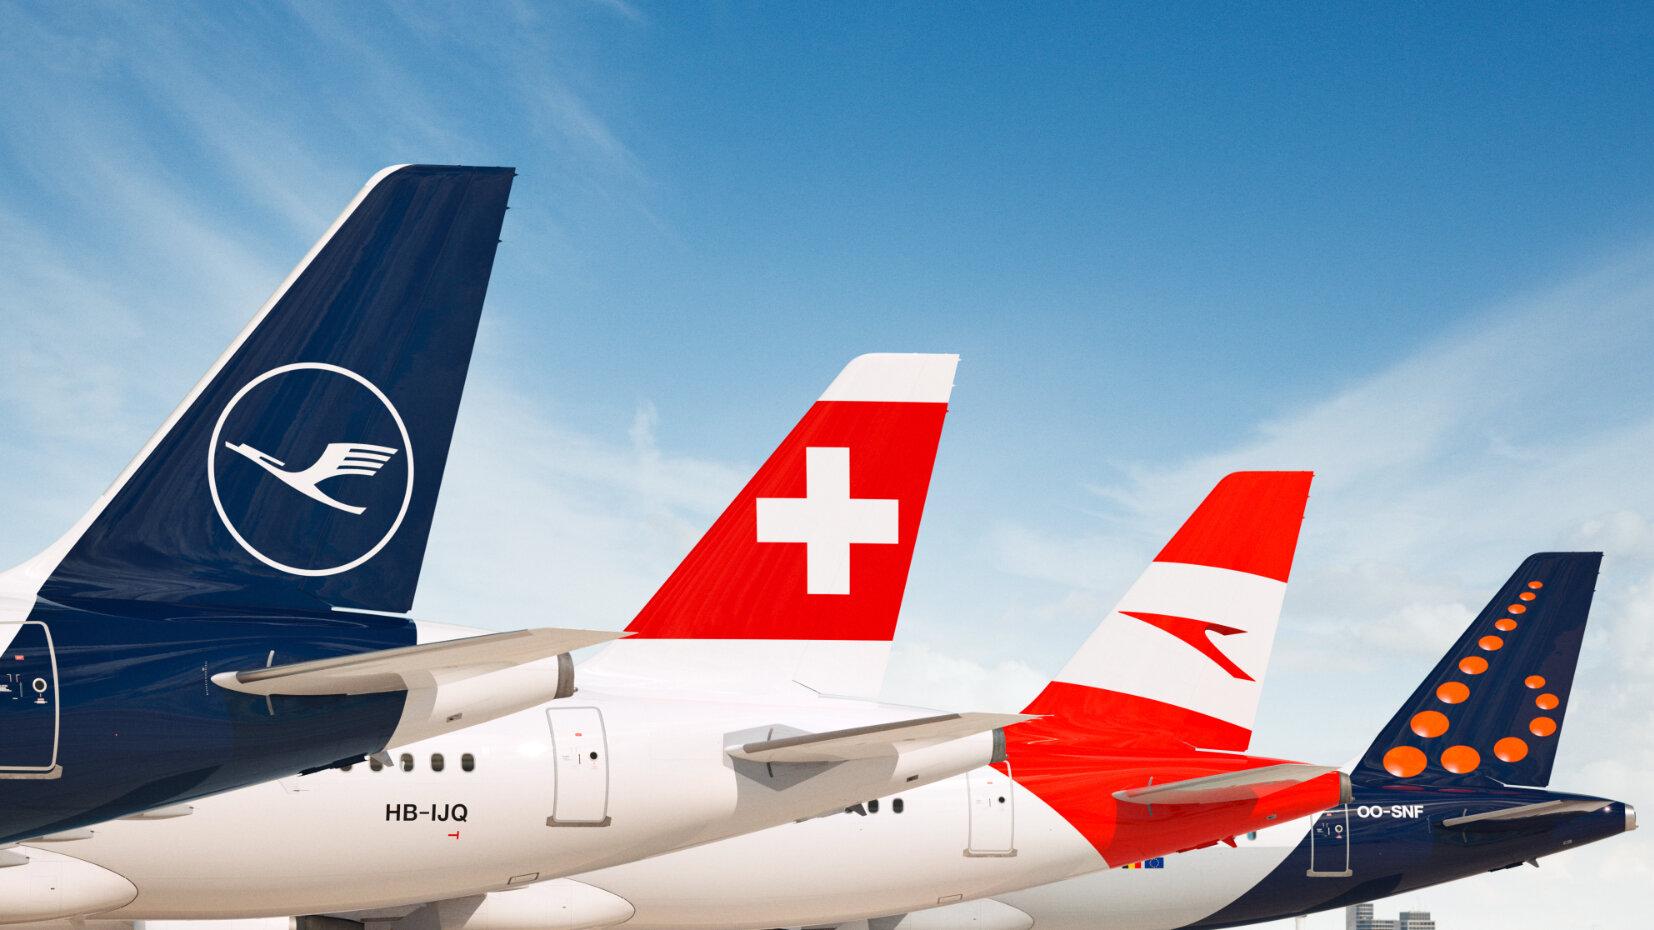 Lufthansa Group: €2.8 billion in airline ticket refunds already paid